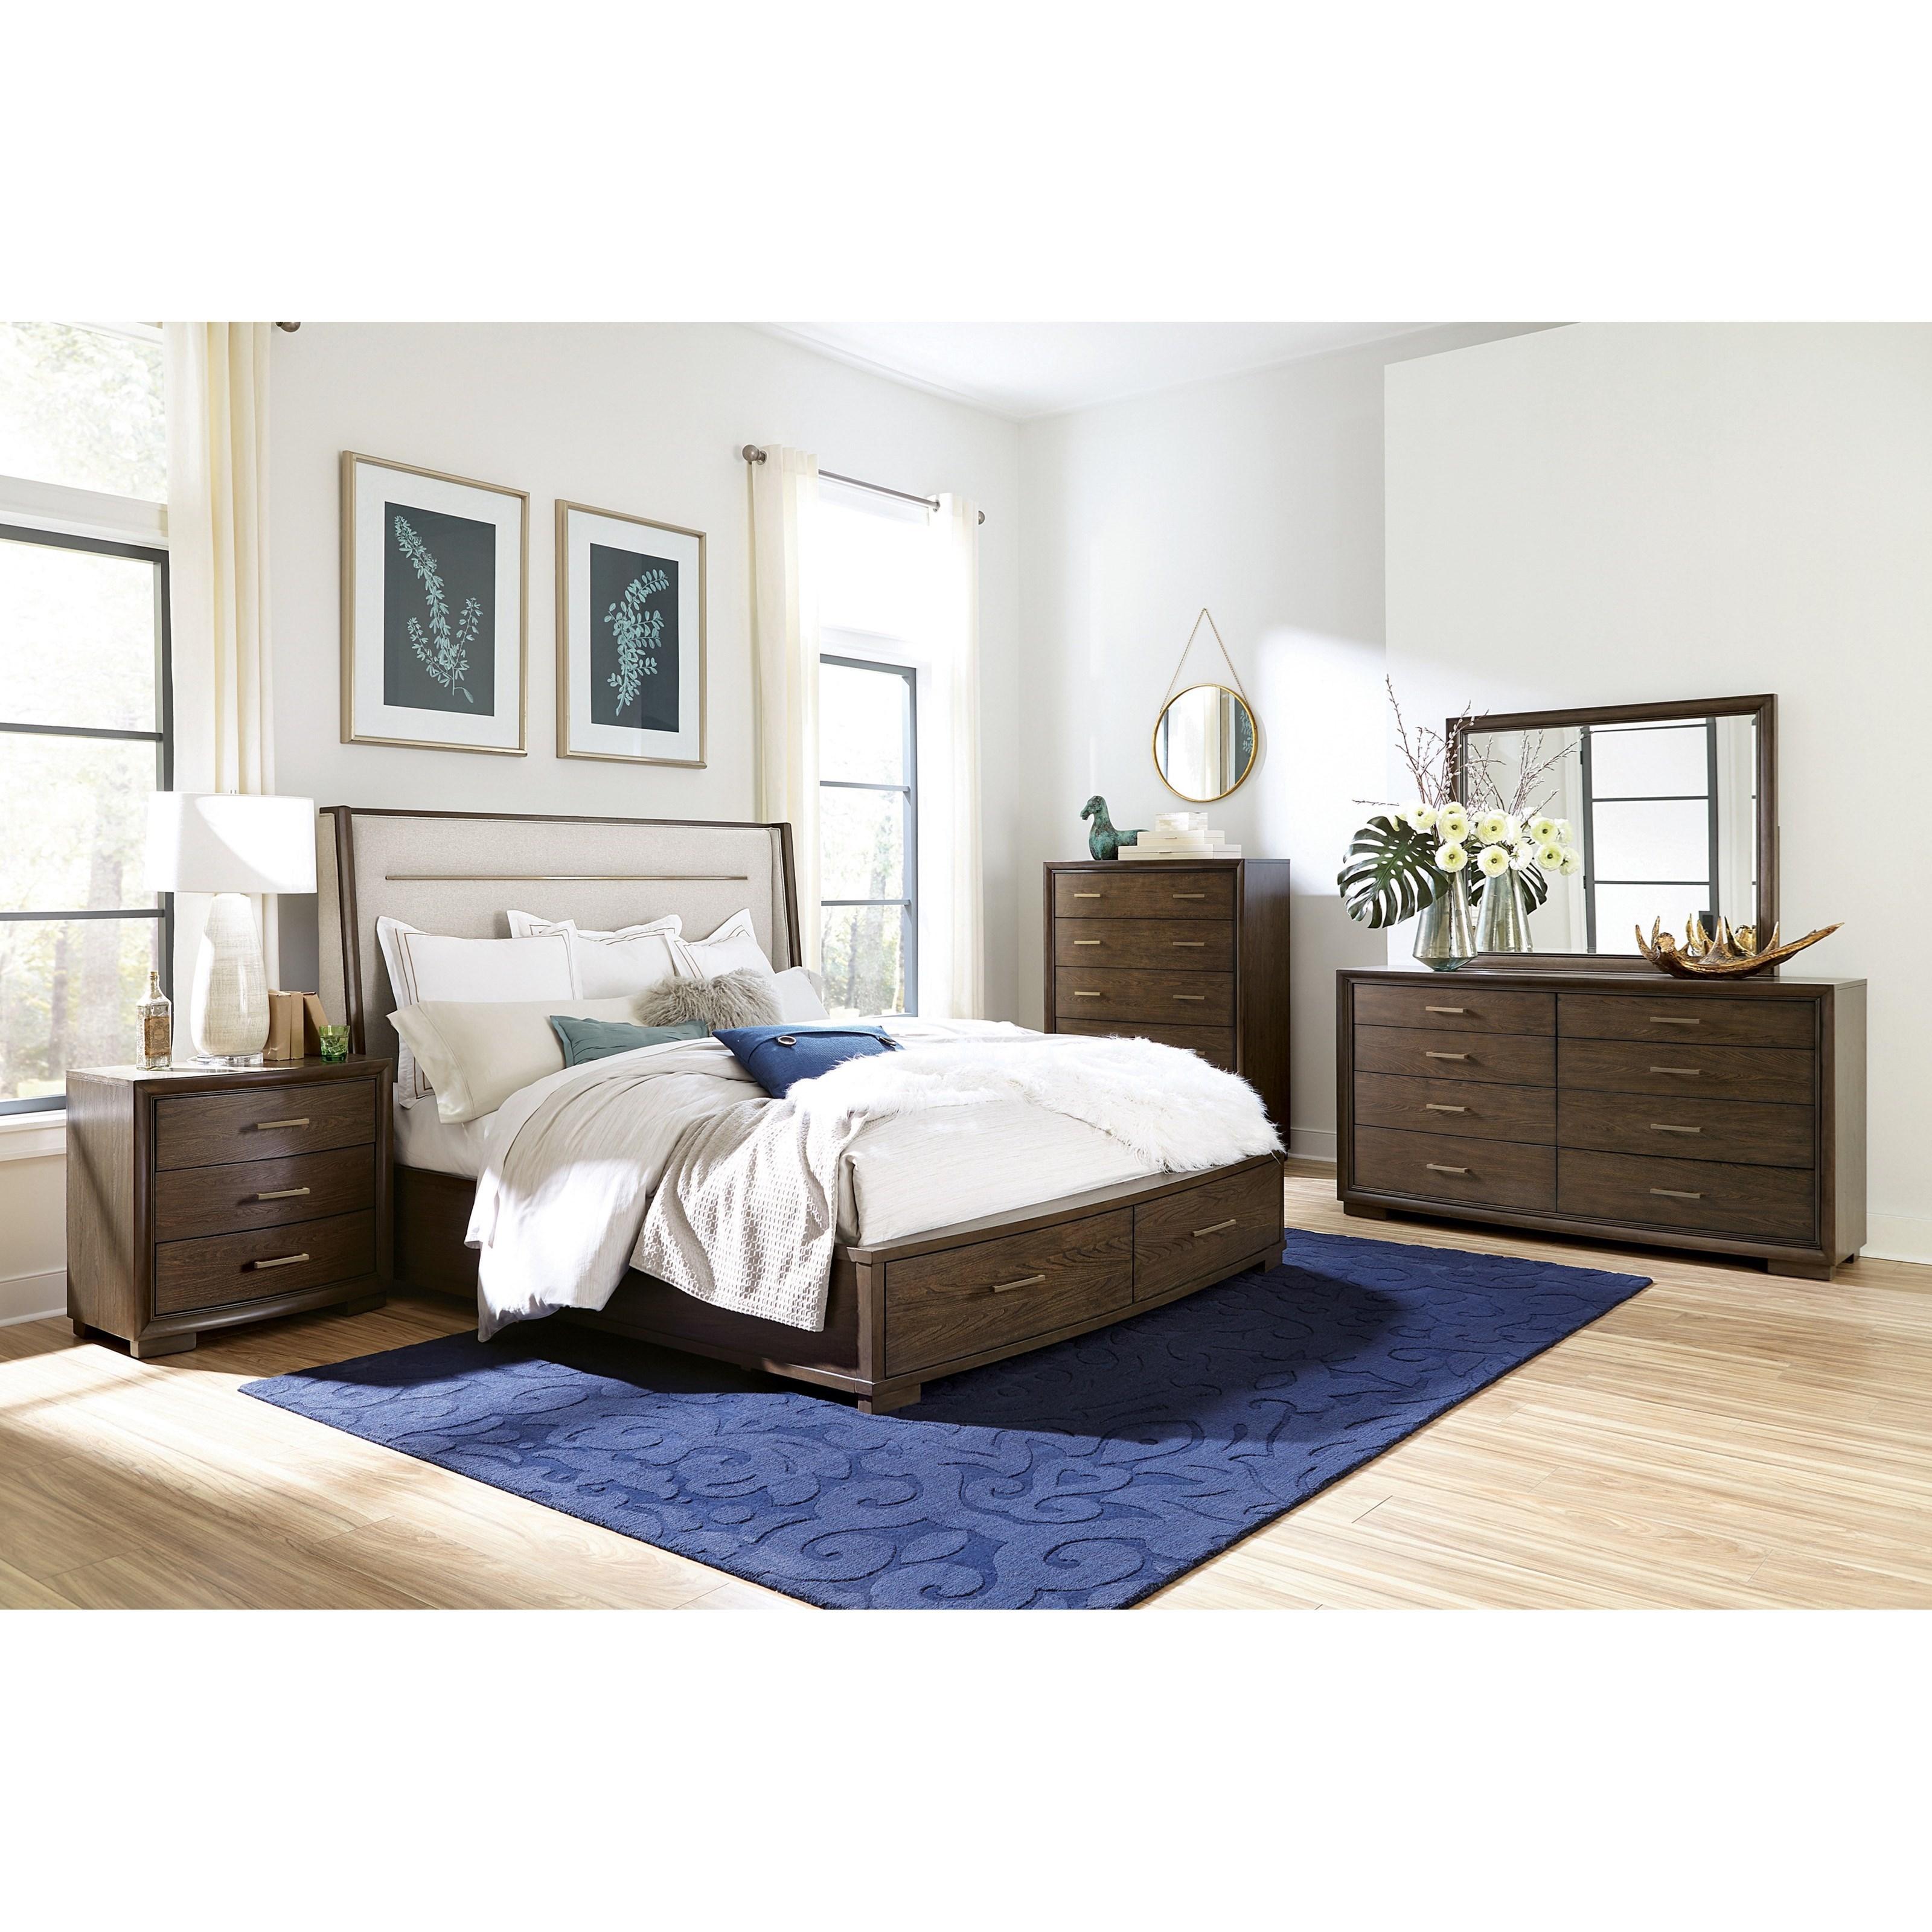 Monterey Queen Upholstered Storage Bedroom Group by Riverside Furniture at Mueller Furniture